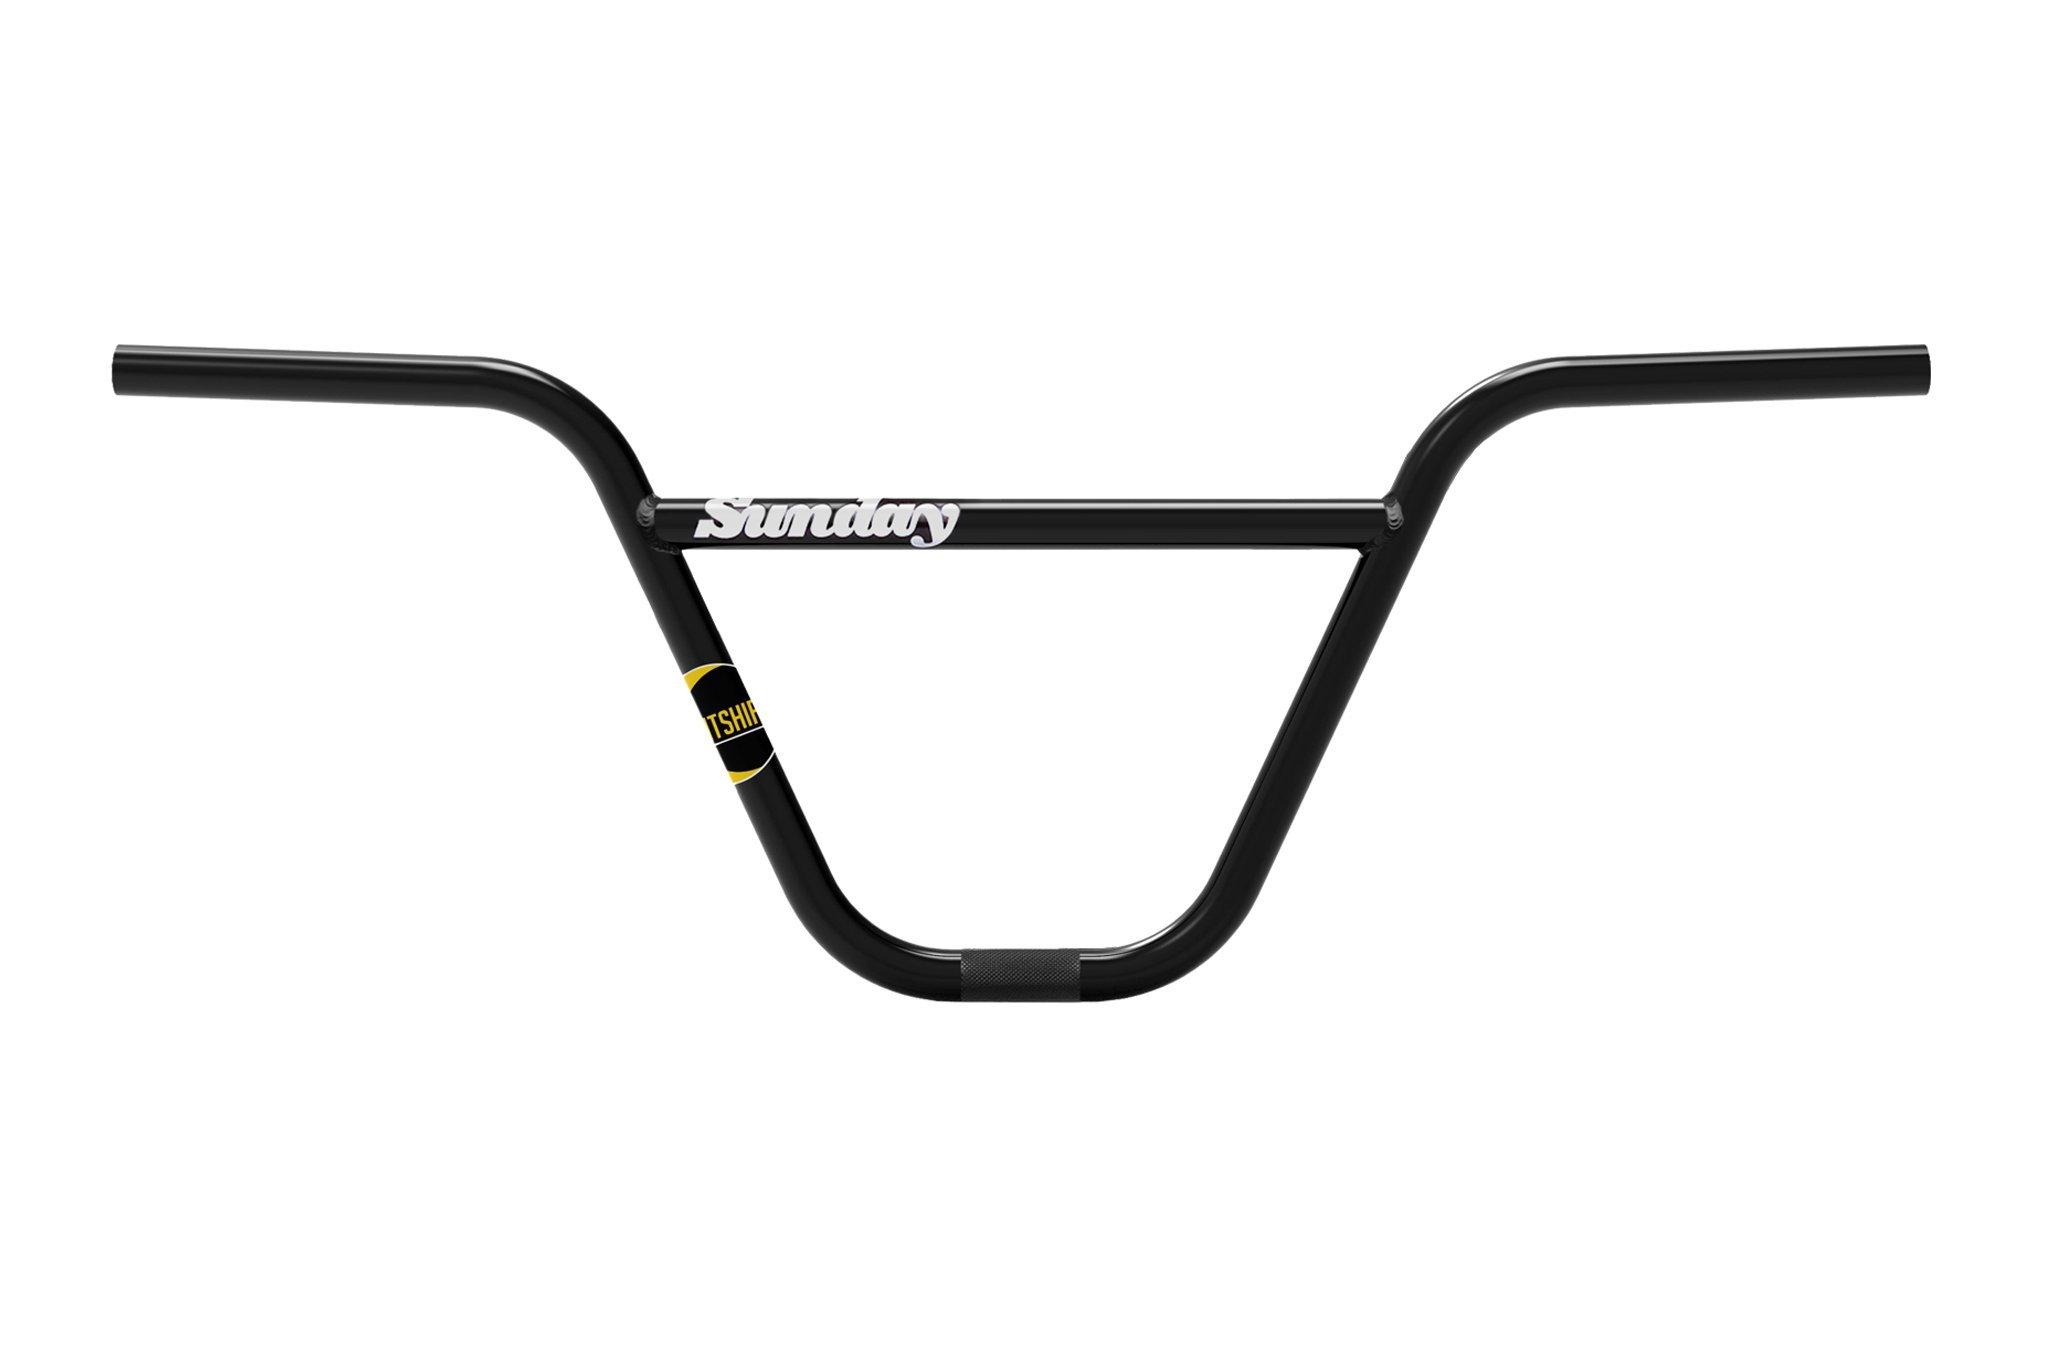 Sunday Bikes Nighshift Bar in schwarz; Rise: 9.625'' oder 10'' Breite: 30'' Backsweep: 11° Upsweep: 2°